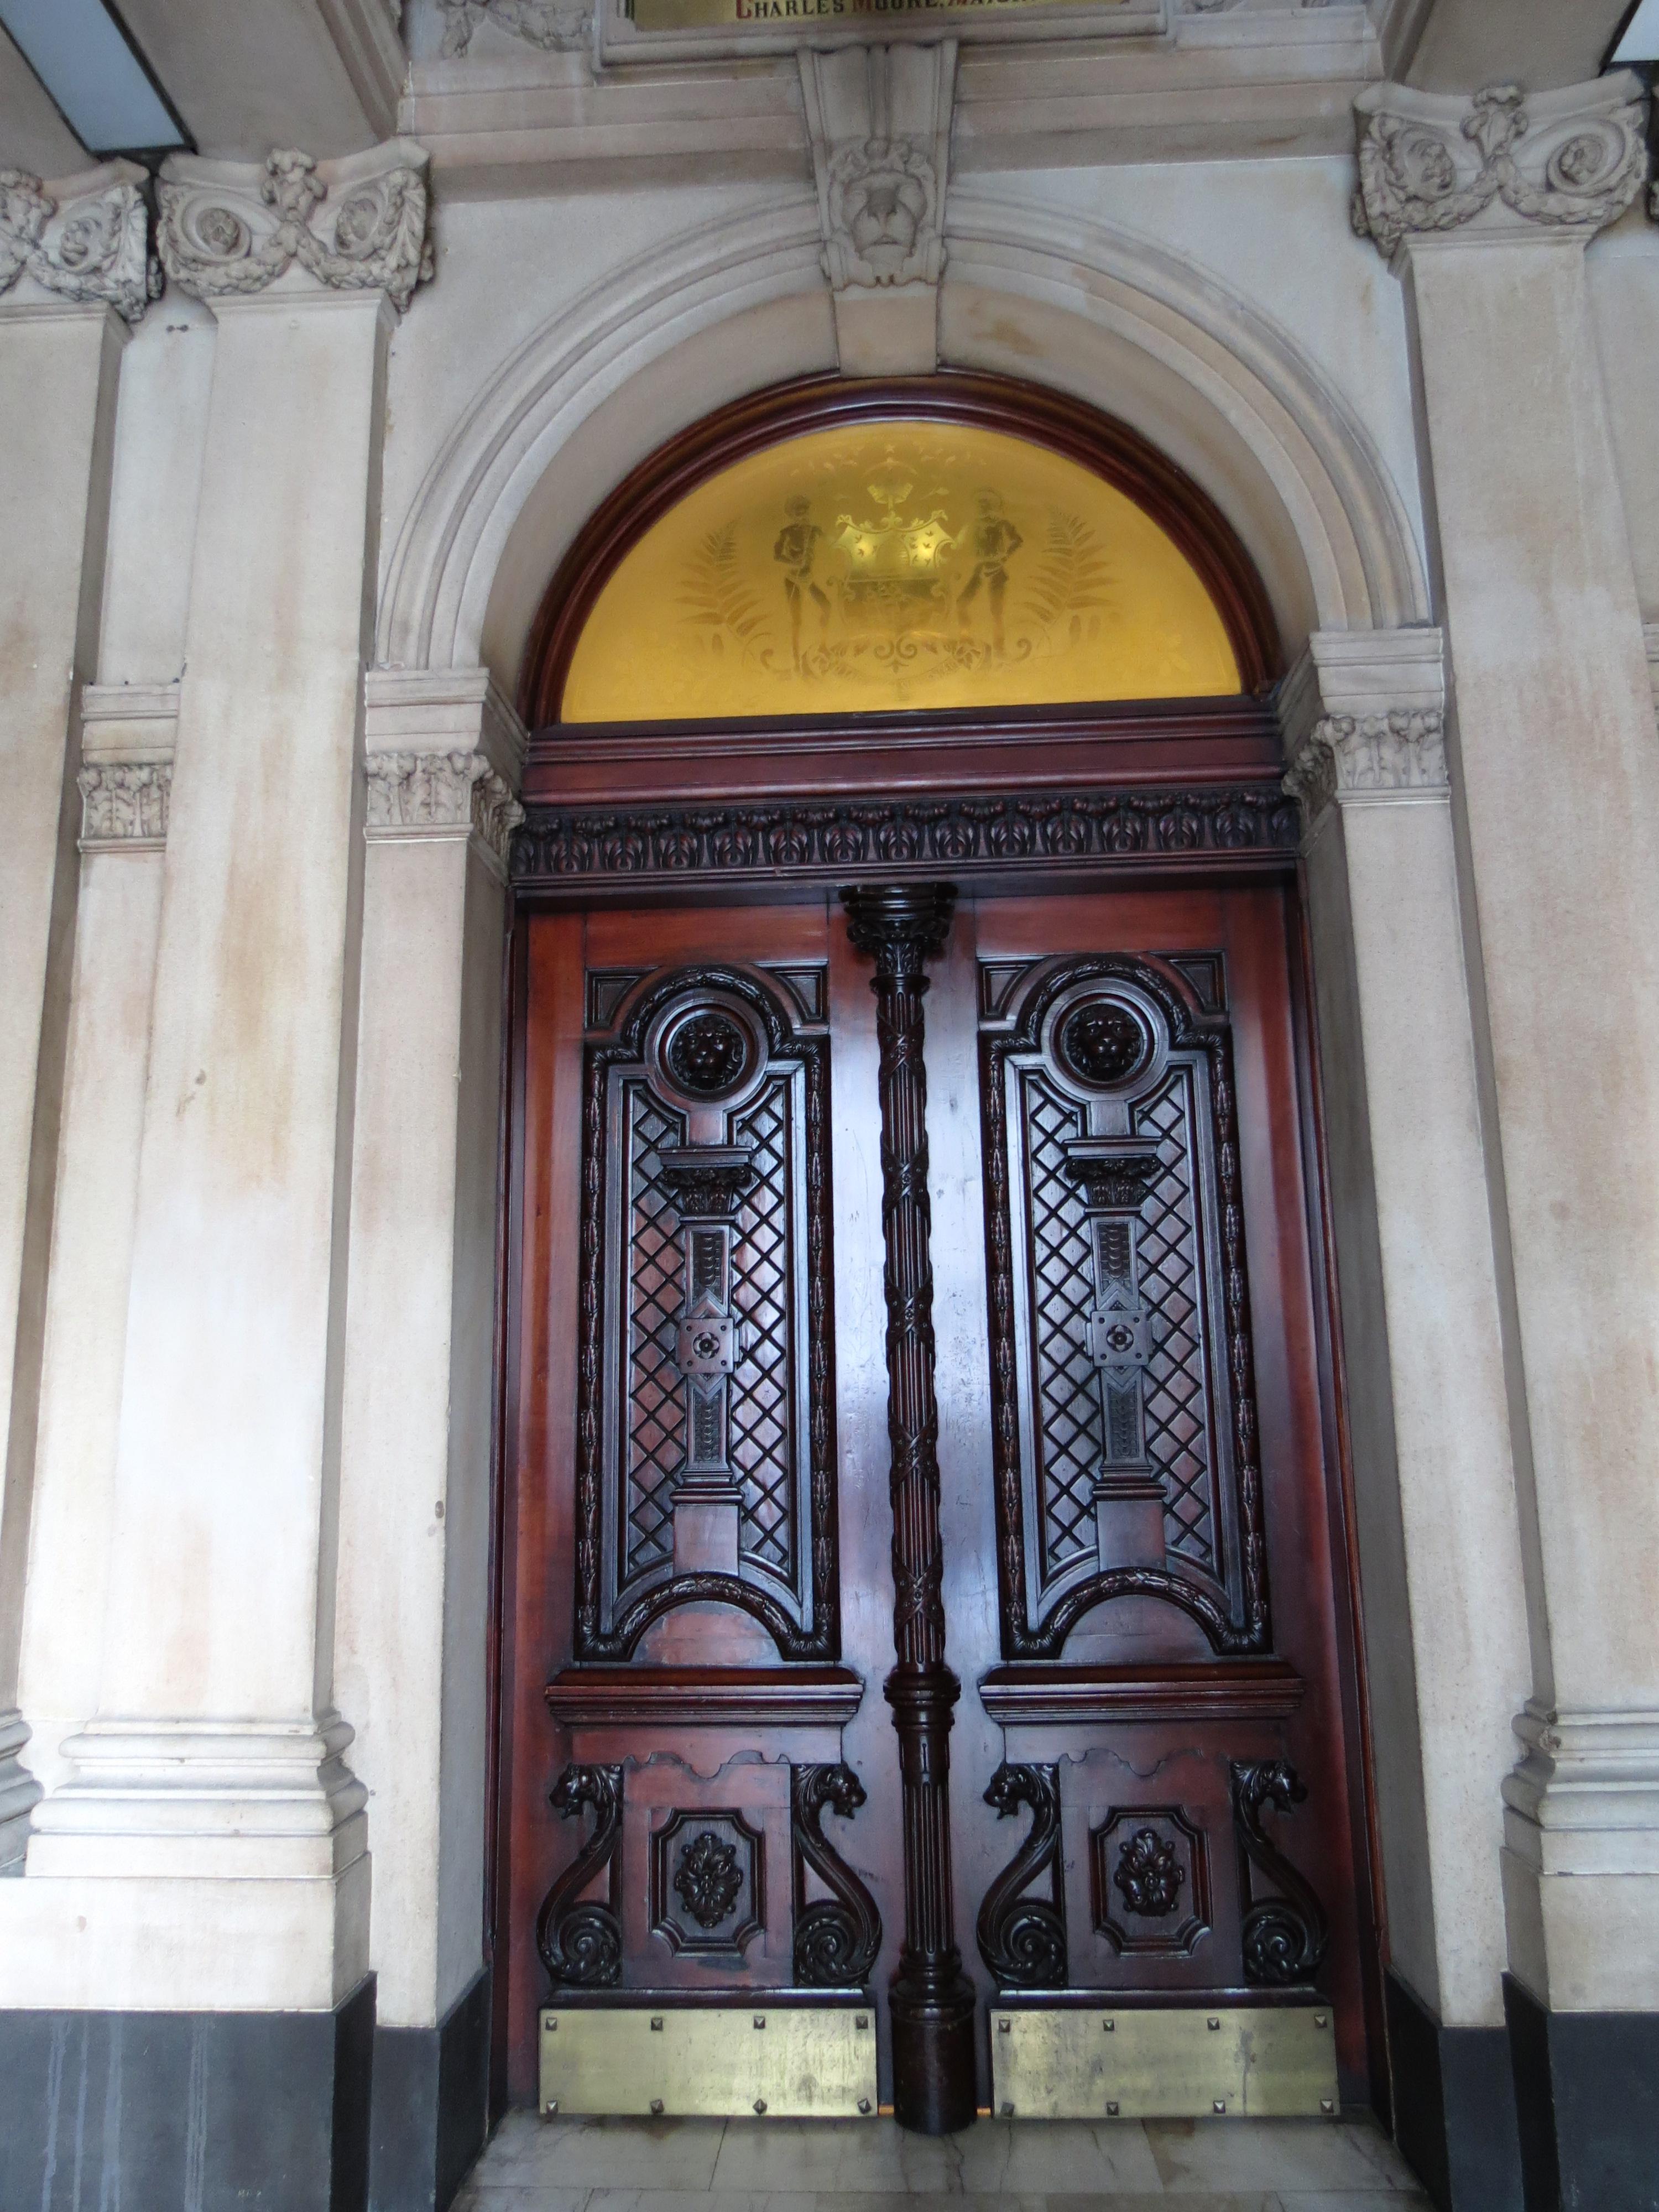 4000 #997A32 Red Cedar Entry Doors picture/photo Cedar Front Doors 42793000